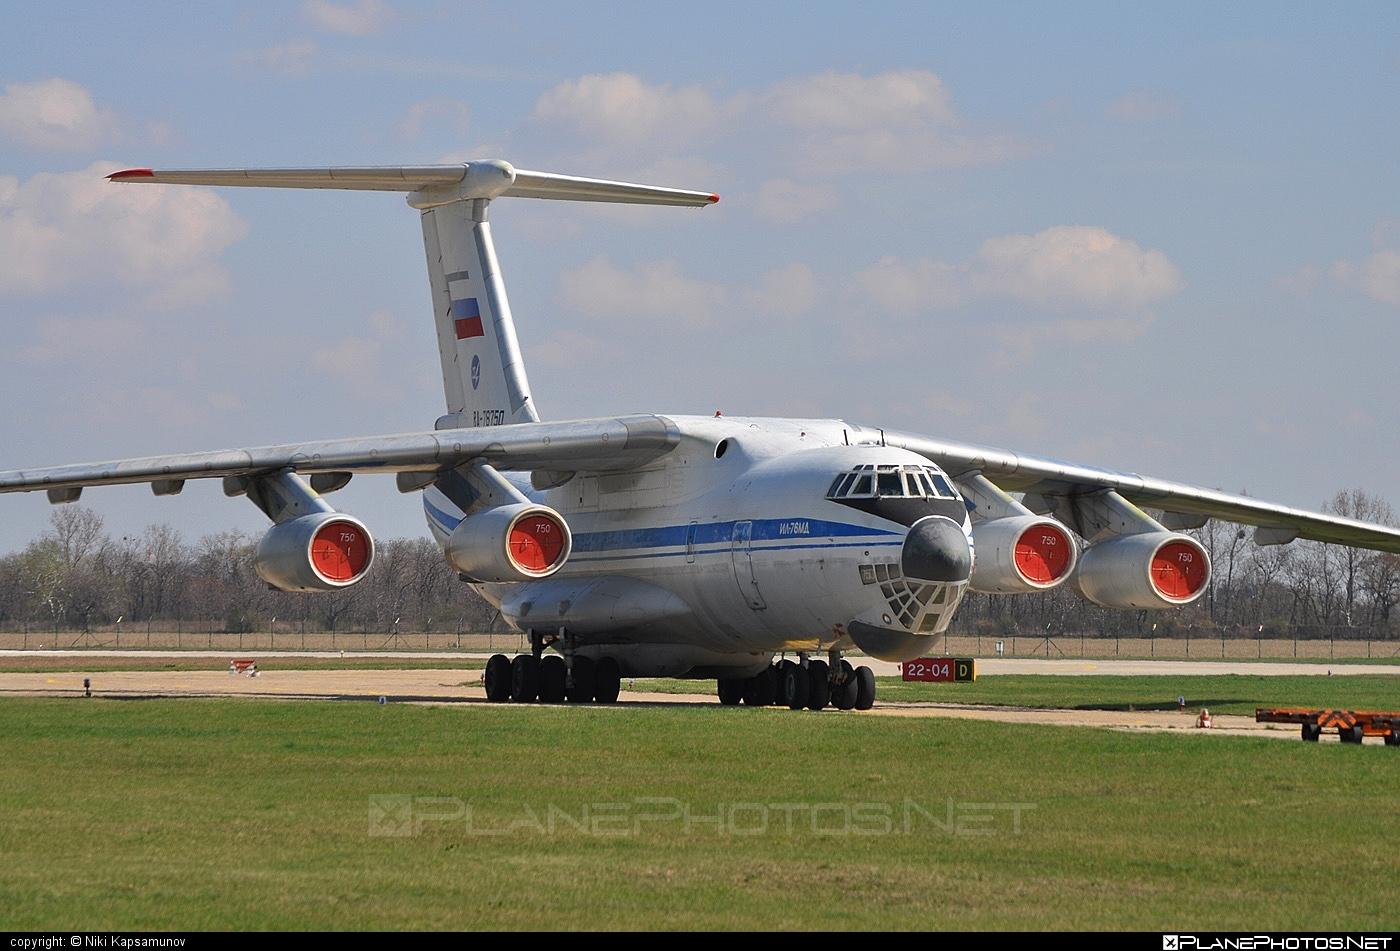 Ilyushin Il-76MD - RA-78750 operated by Voyenno-vozdushnye sily Rossii (Russian Air Force) #il76 #il76md #ilyushin